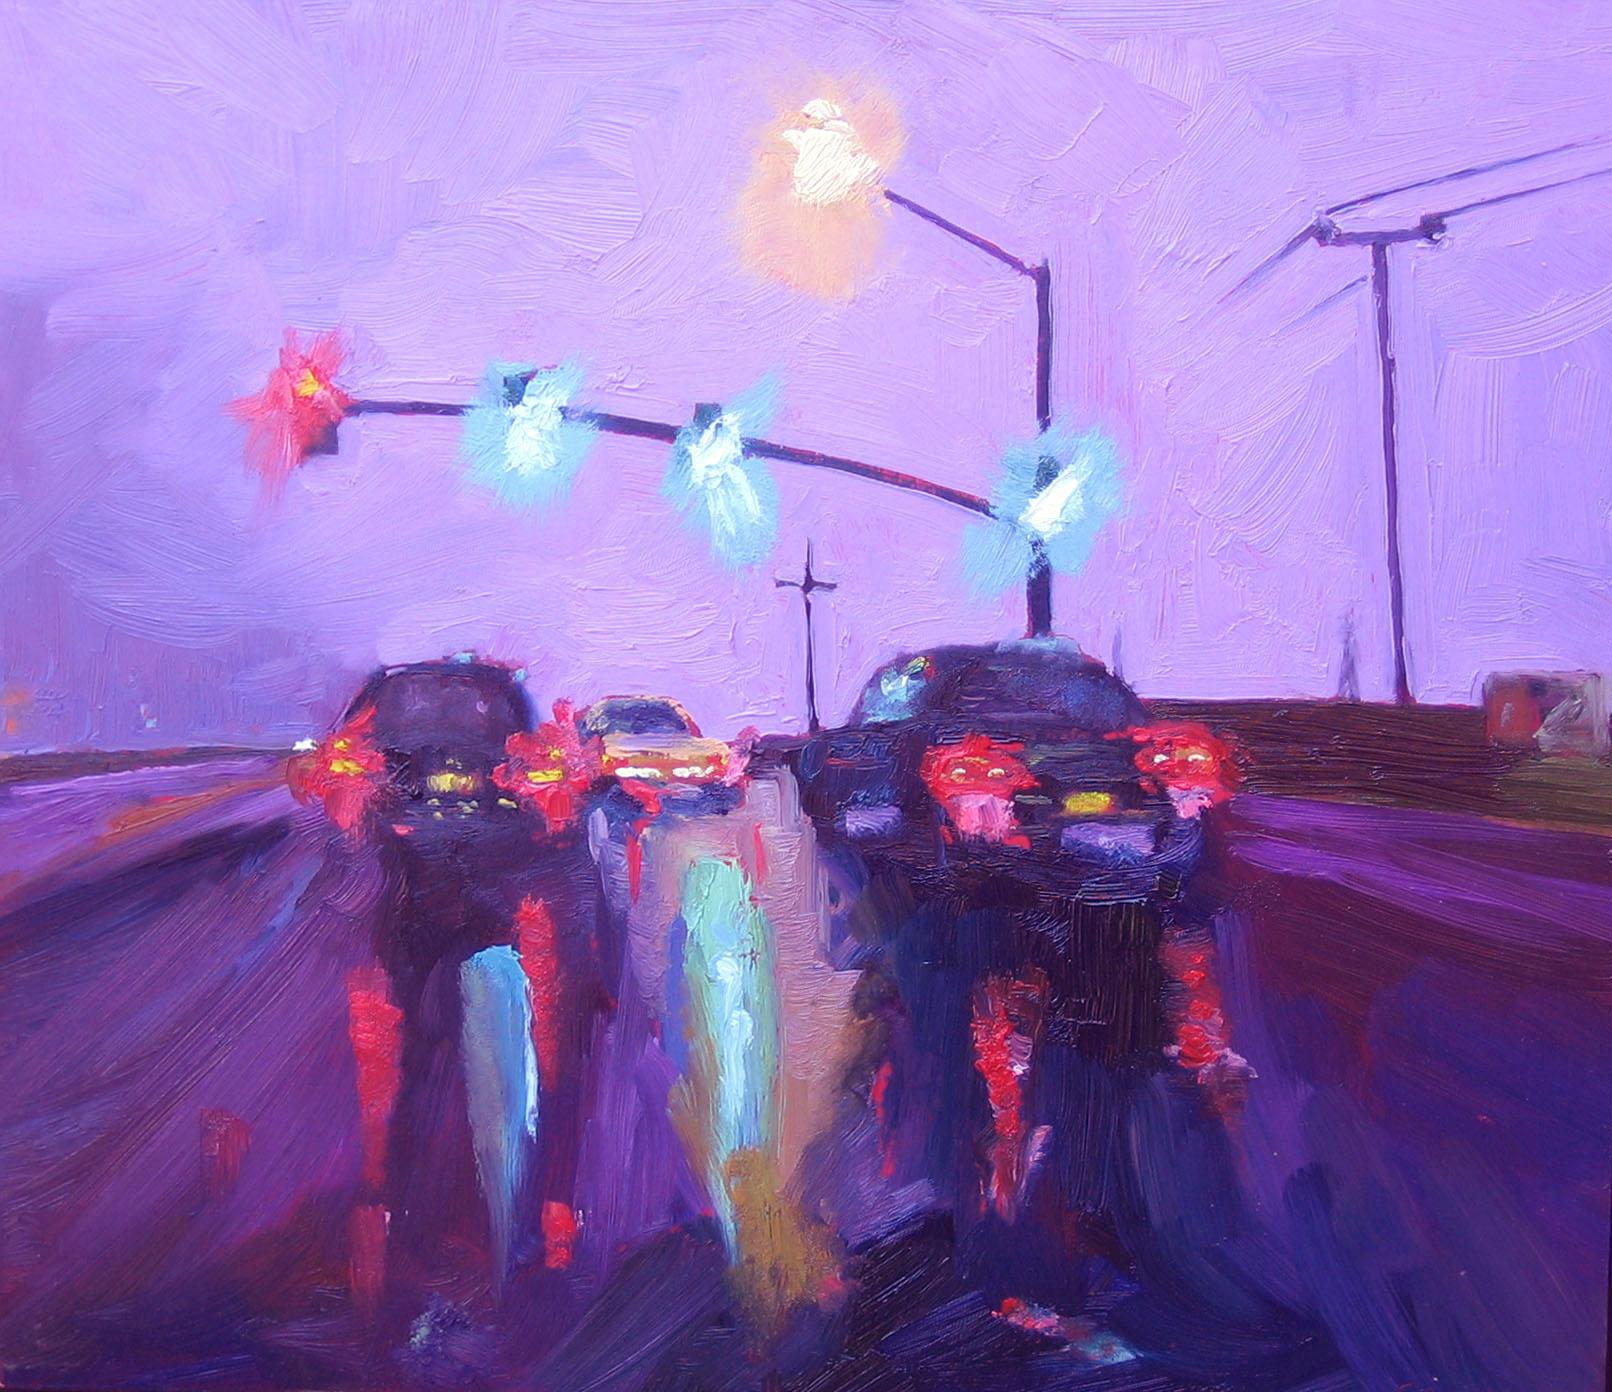 sonoma+hwy+(traffic+lights).jpg